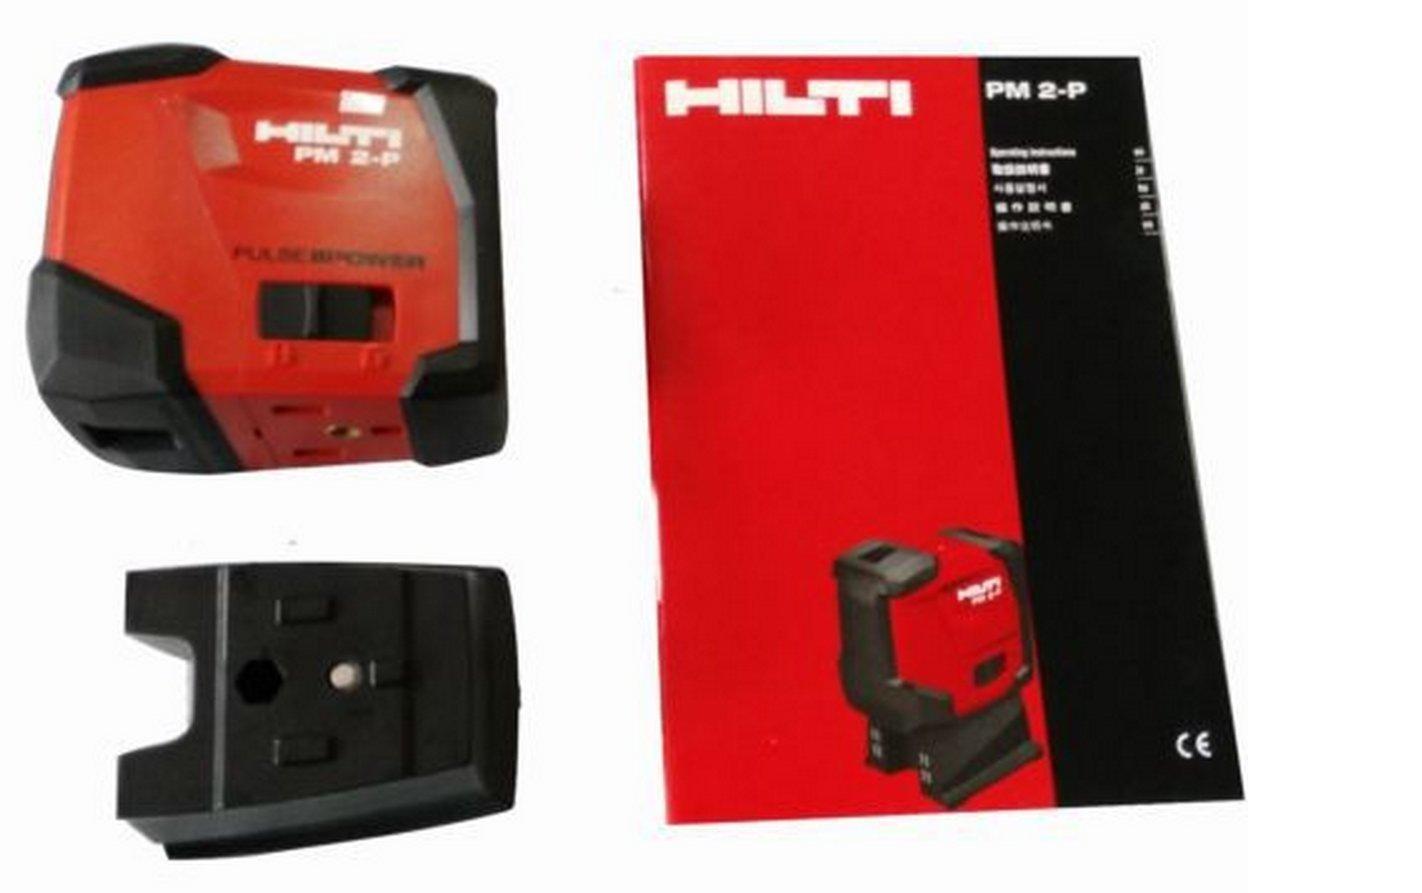 Cheap Hilti Laser Meter Find Hilti Laser Meter Deals On Line At